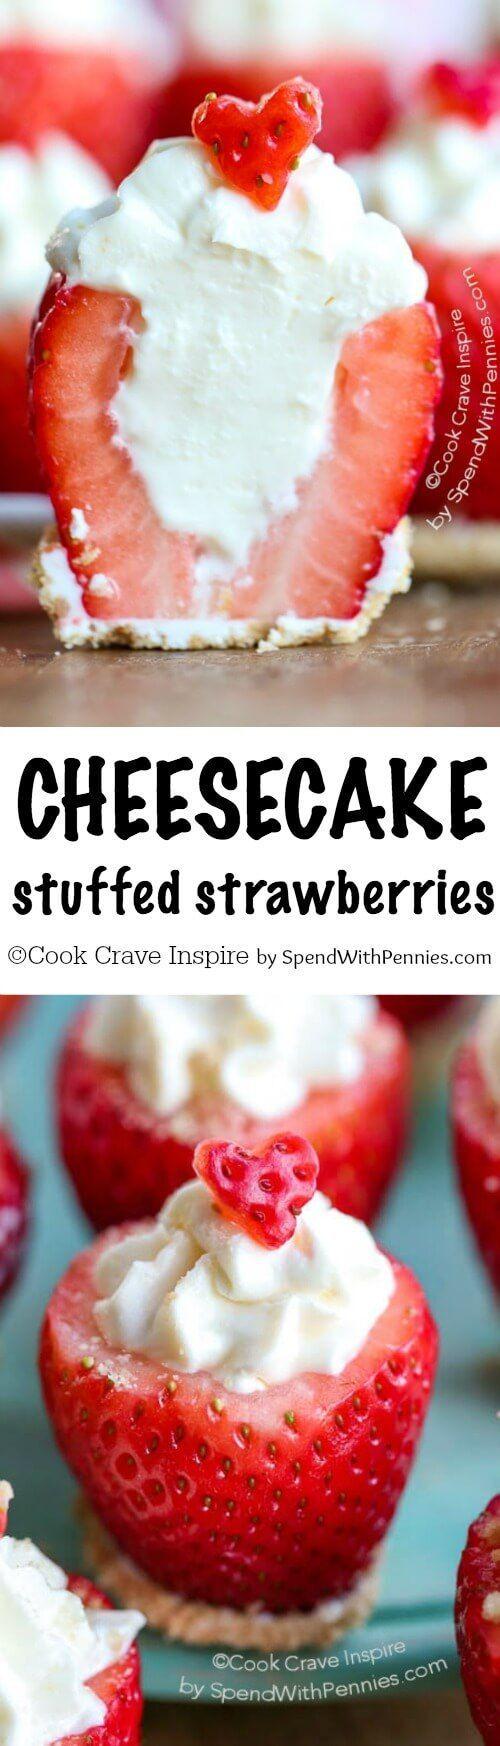 Cheesecake Stuffed Strawberries are an easy no bake dessert recipe! Fresh juicy berries are filled with an easy no bake cheesecake!